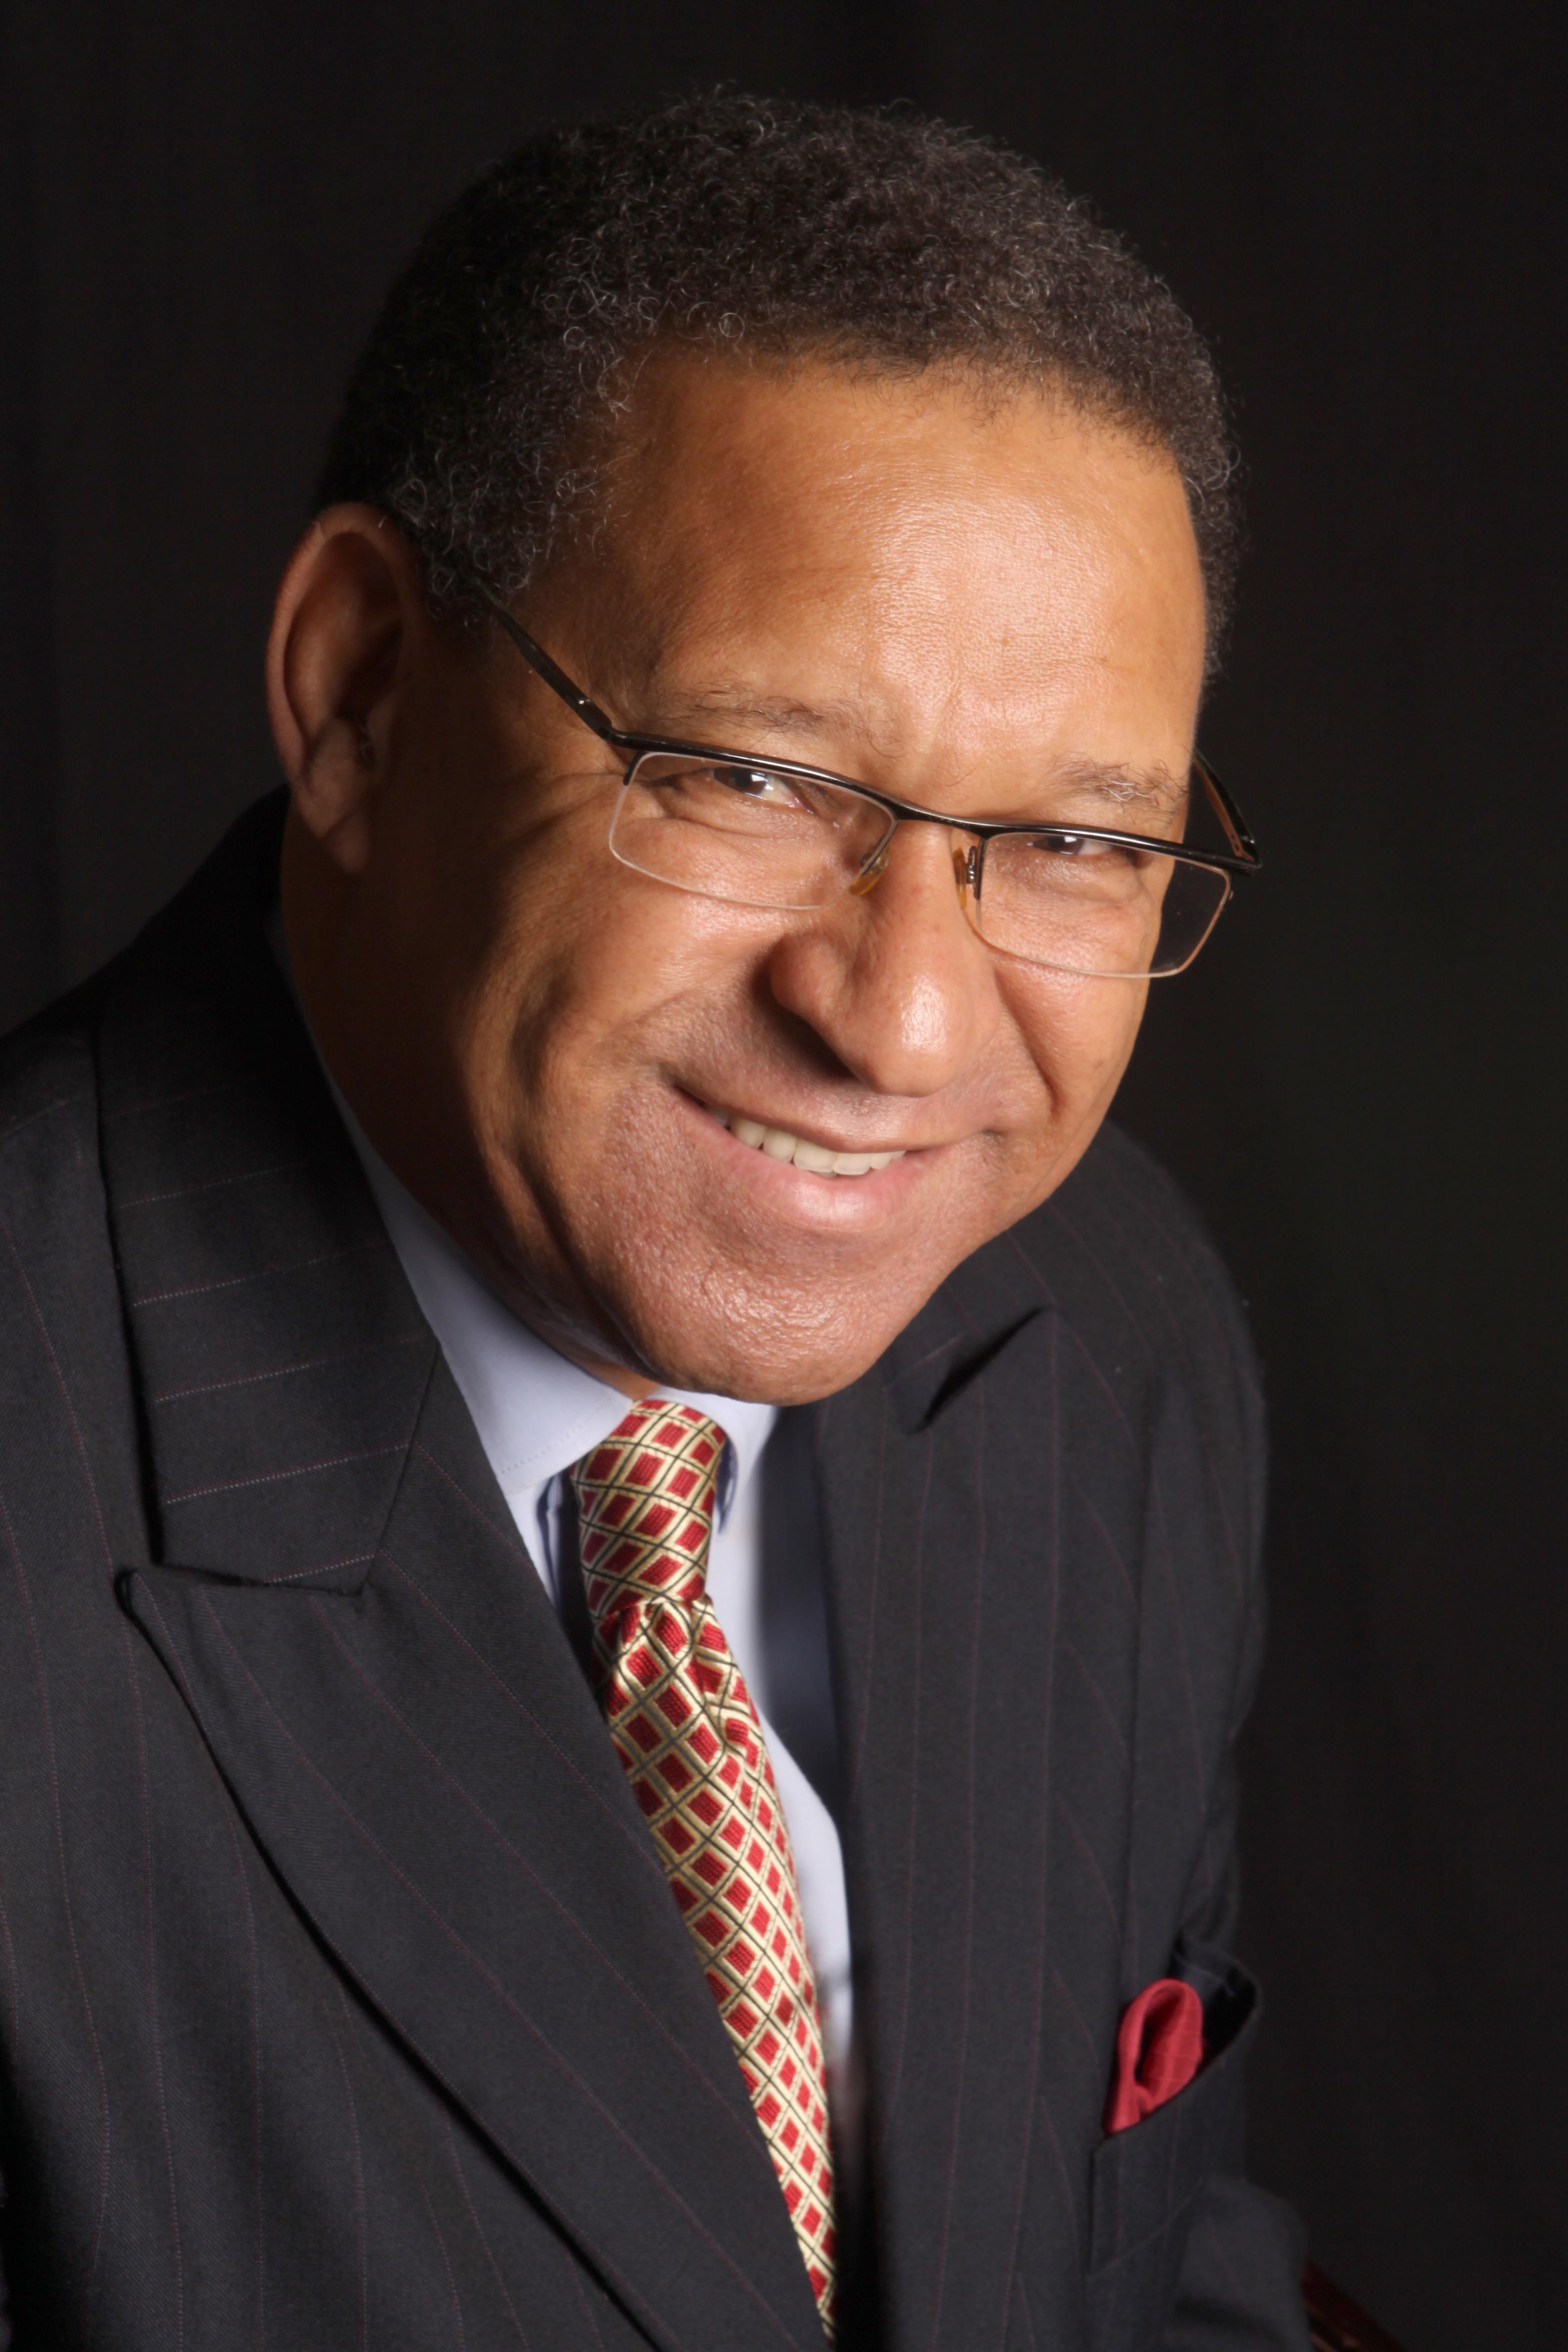 An image of Rev. Dr. Allan Boesak